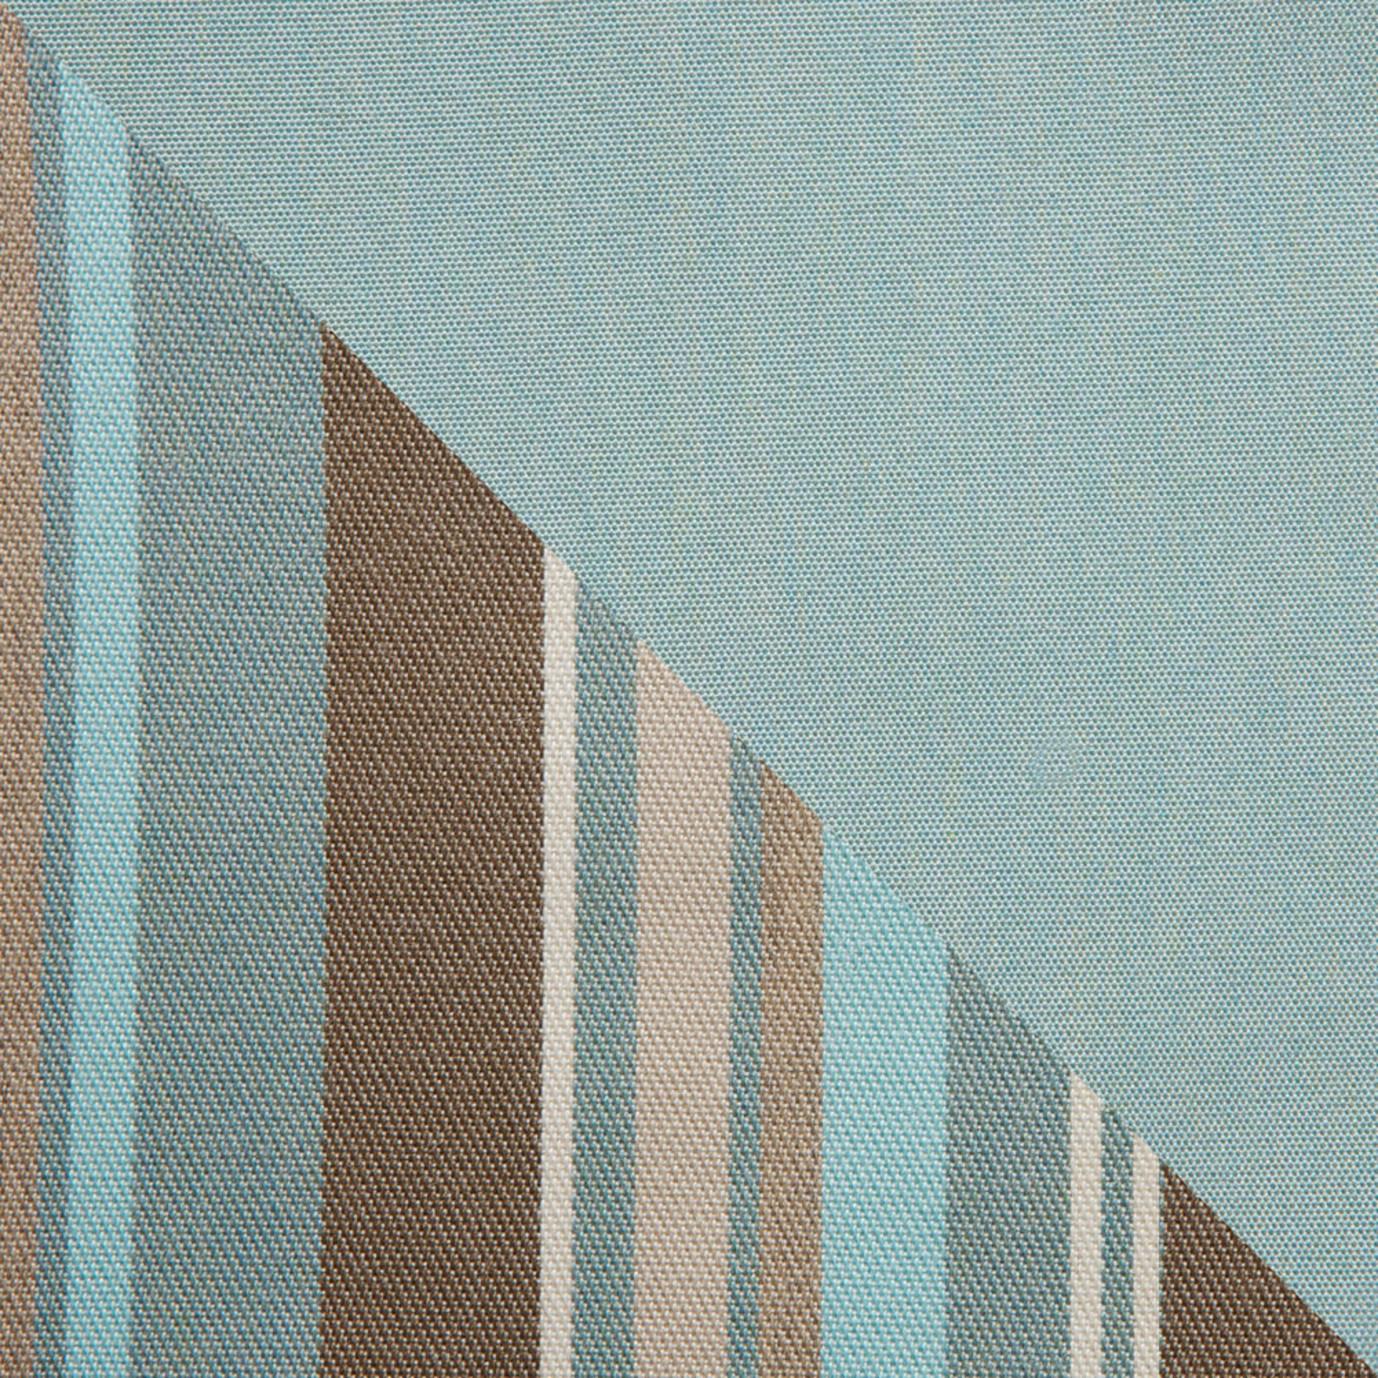 Deco™ Corner Chair - Bliss Blue